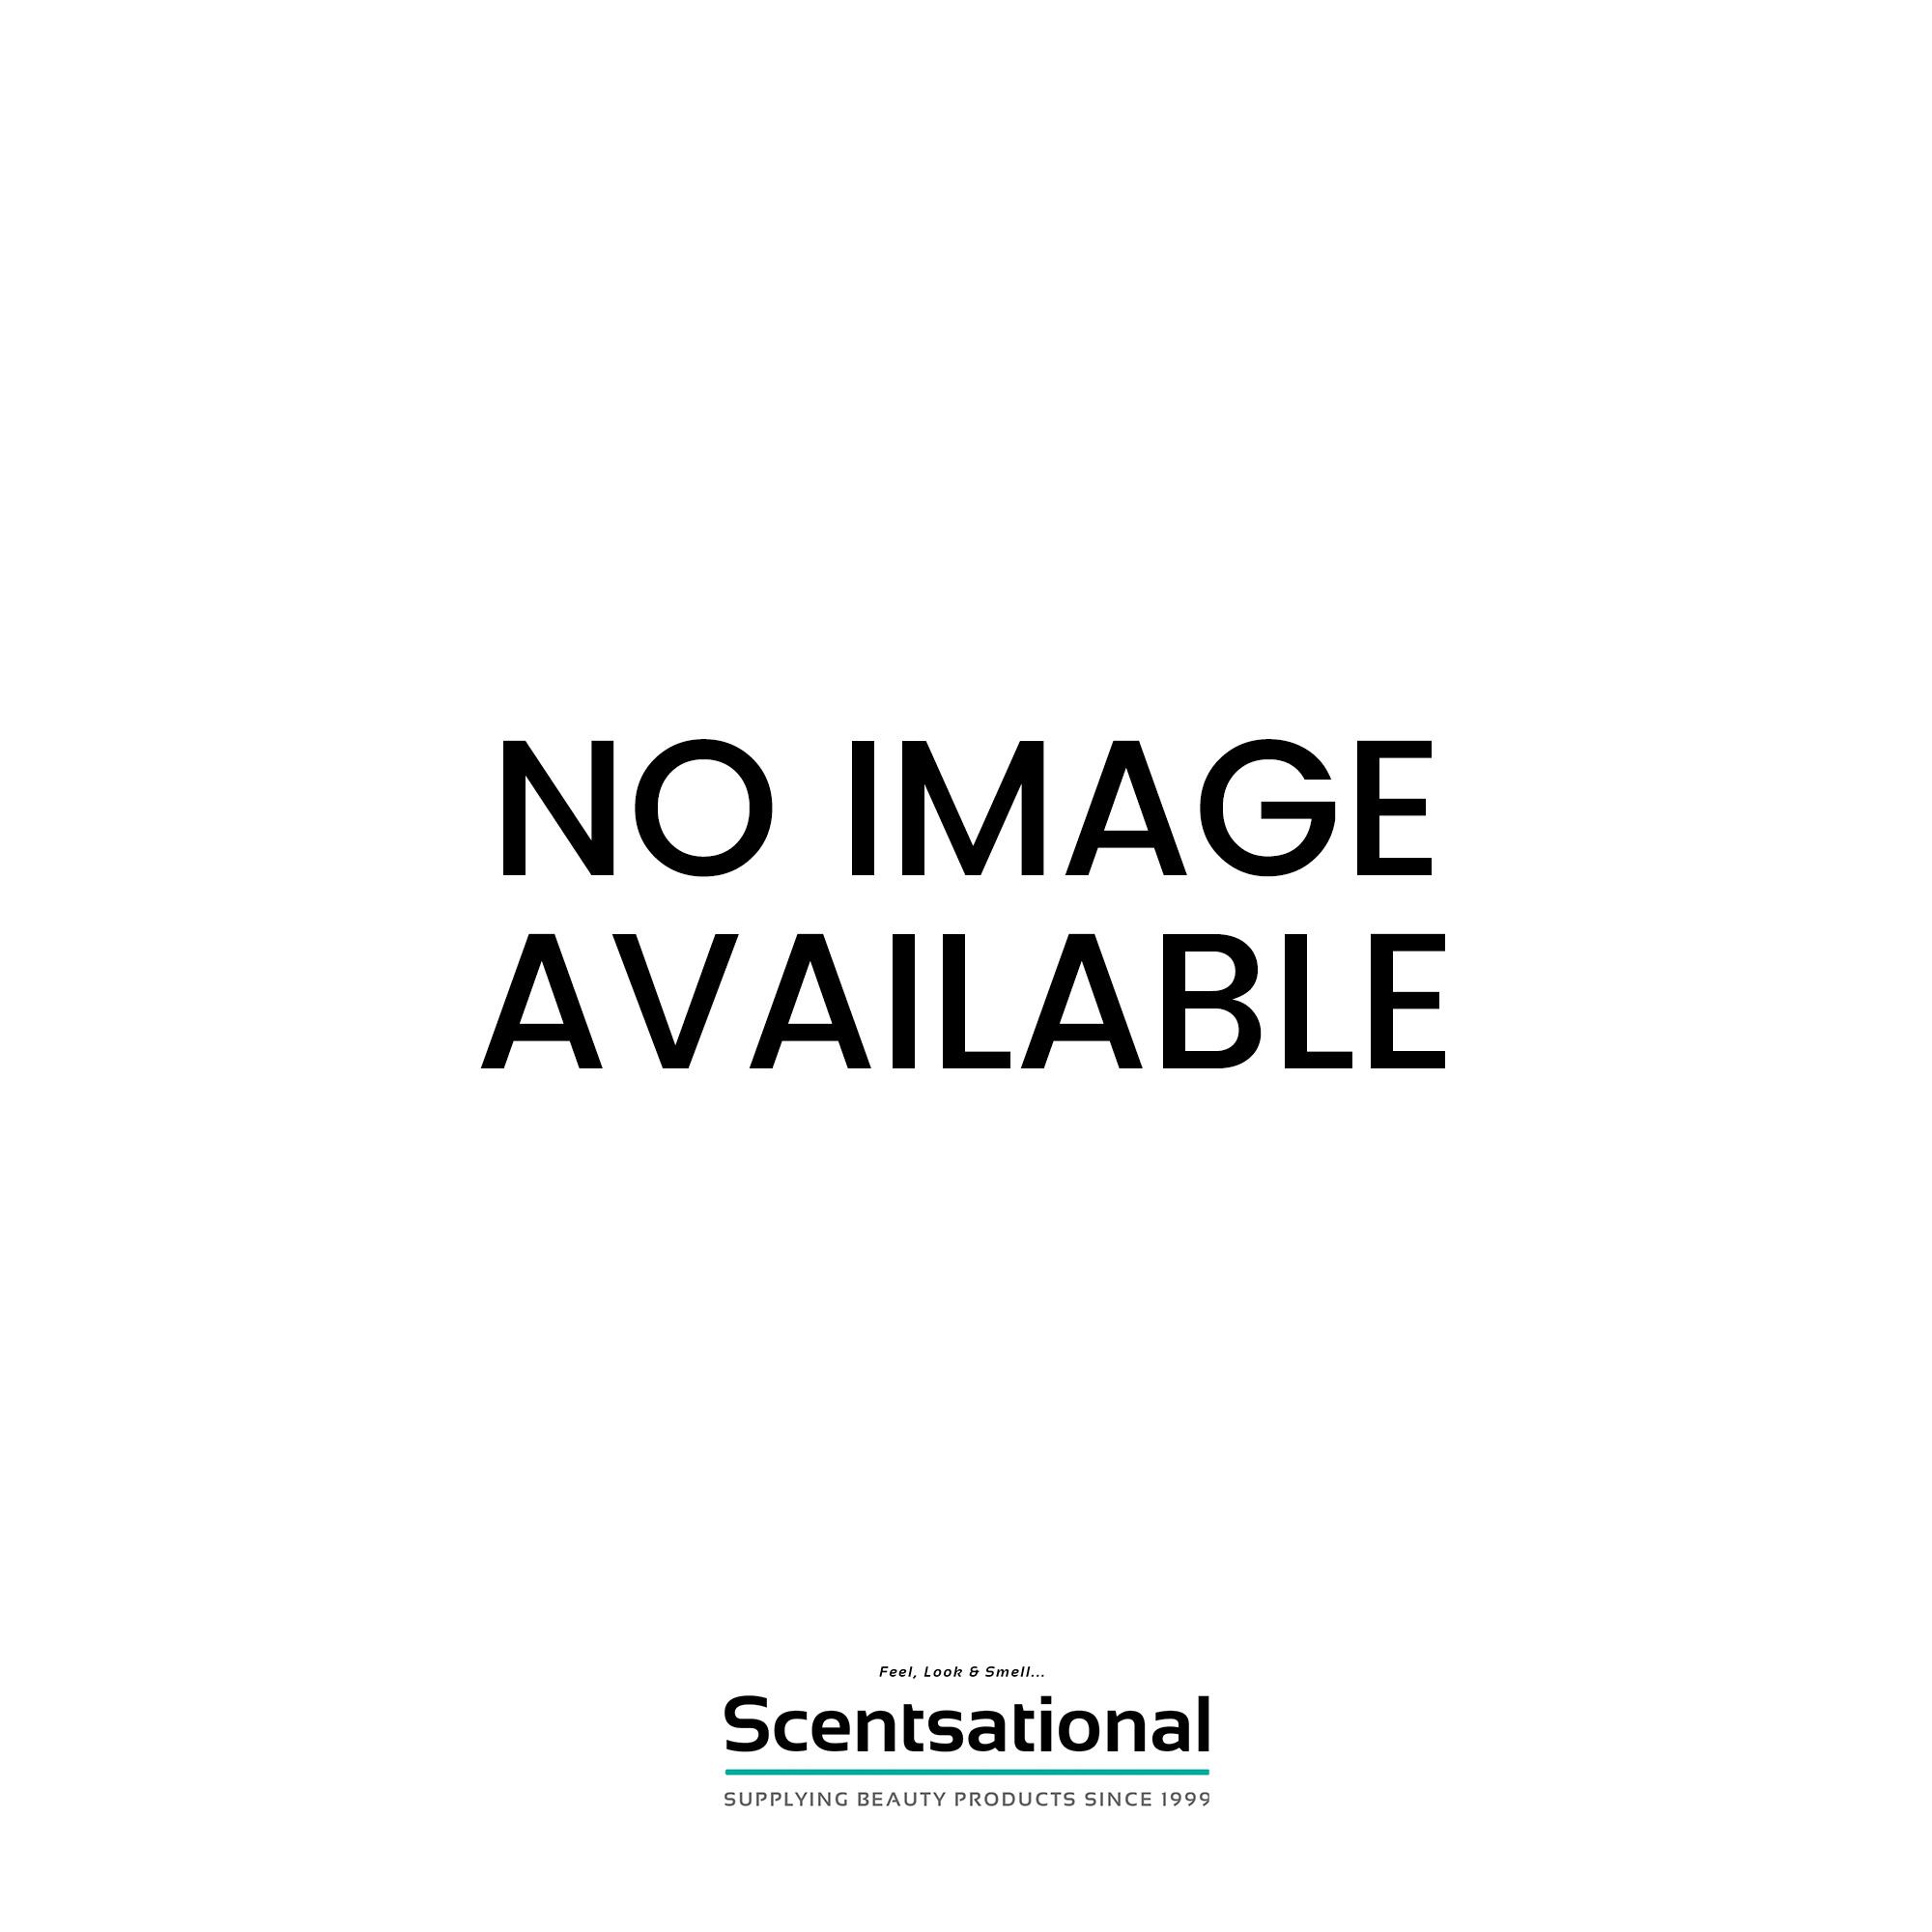 Calvin Klein Euphoria - 200ml Sensual Skin Lotion.